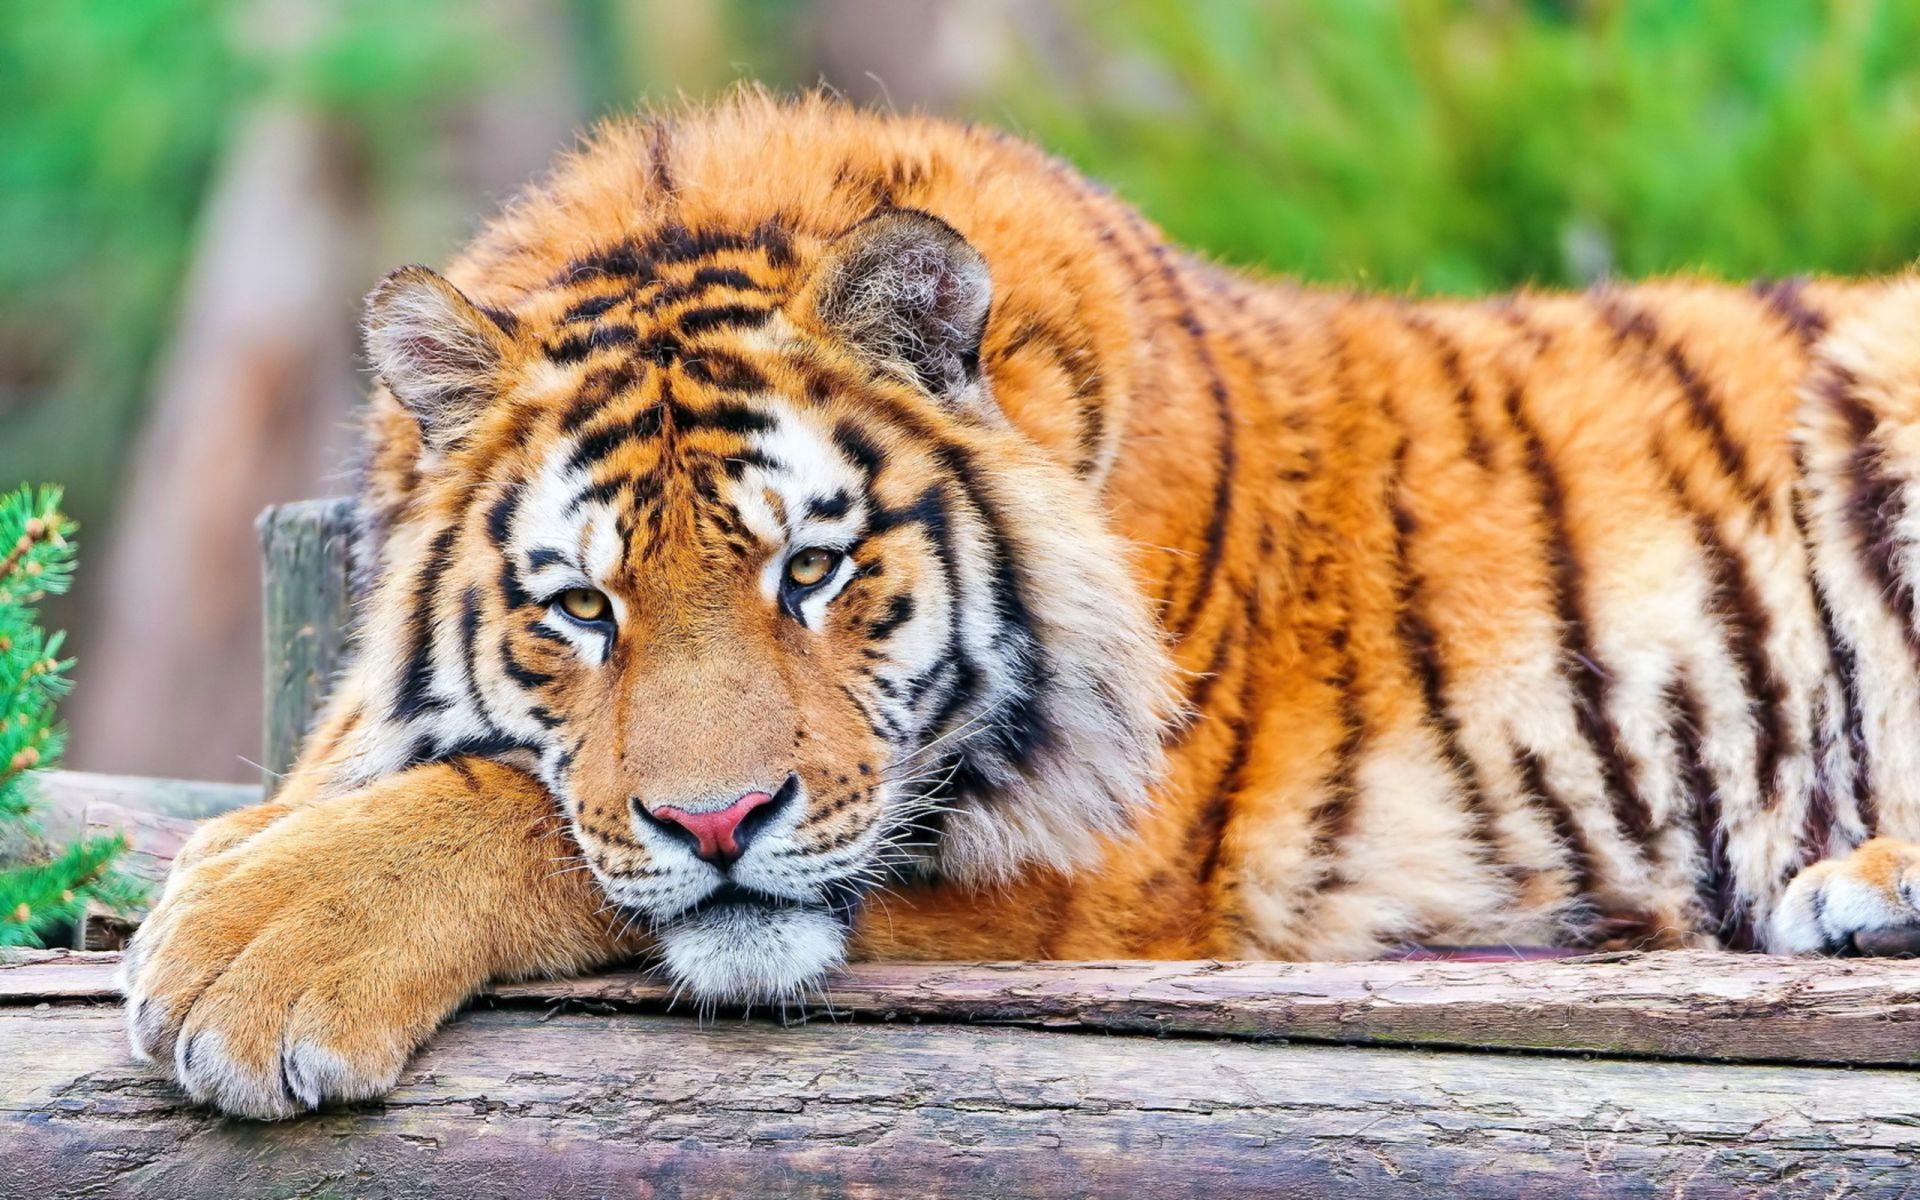 Tiger just resting, Desktop Wallpaper